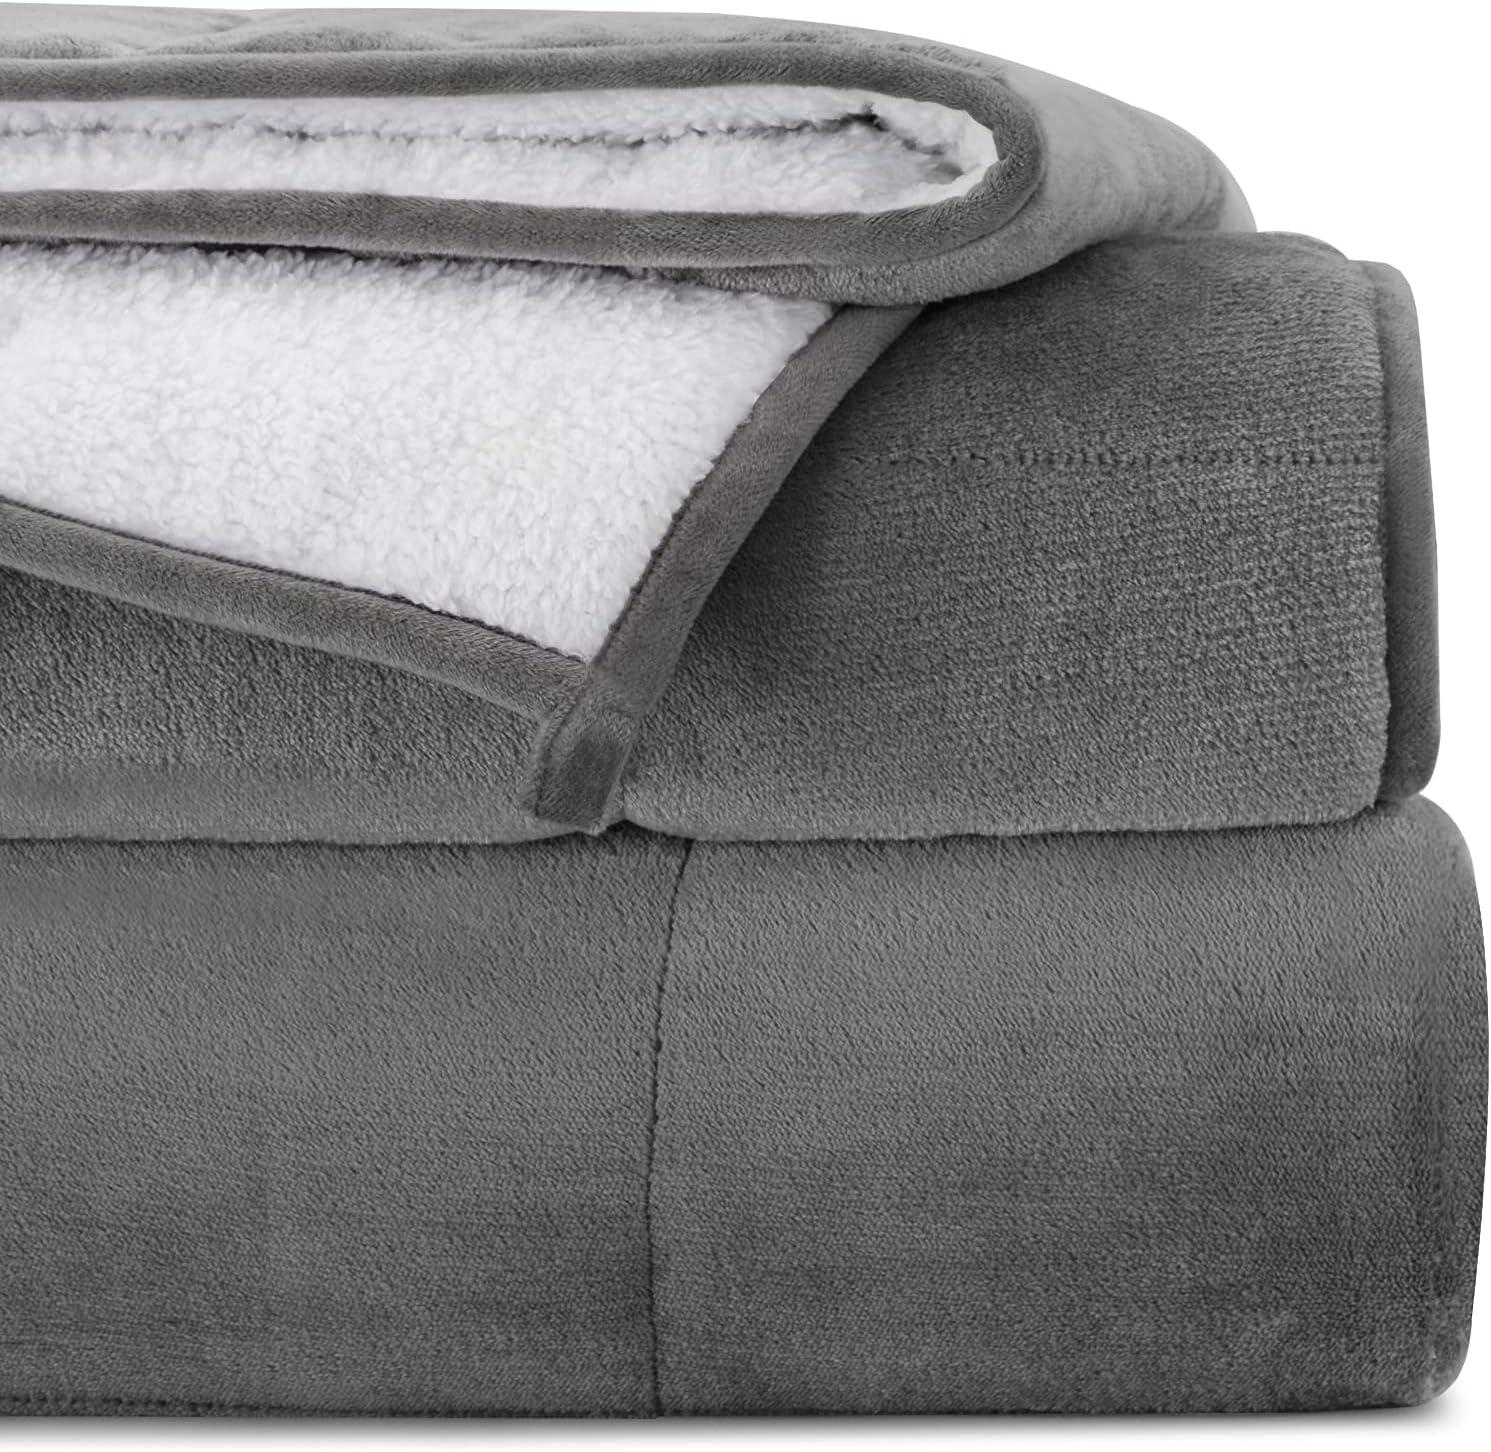 Luxury Fleece Weighted Blanket for Kids Oeko-Tex 5LBS 36x48 Certified Los Angeles Mall